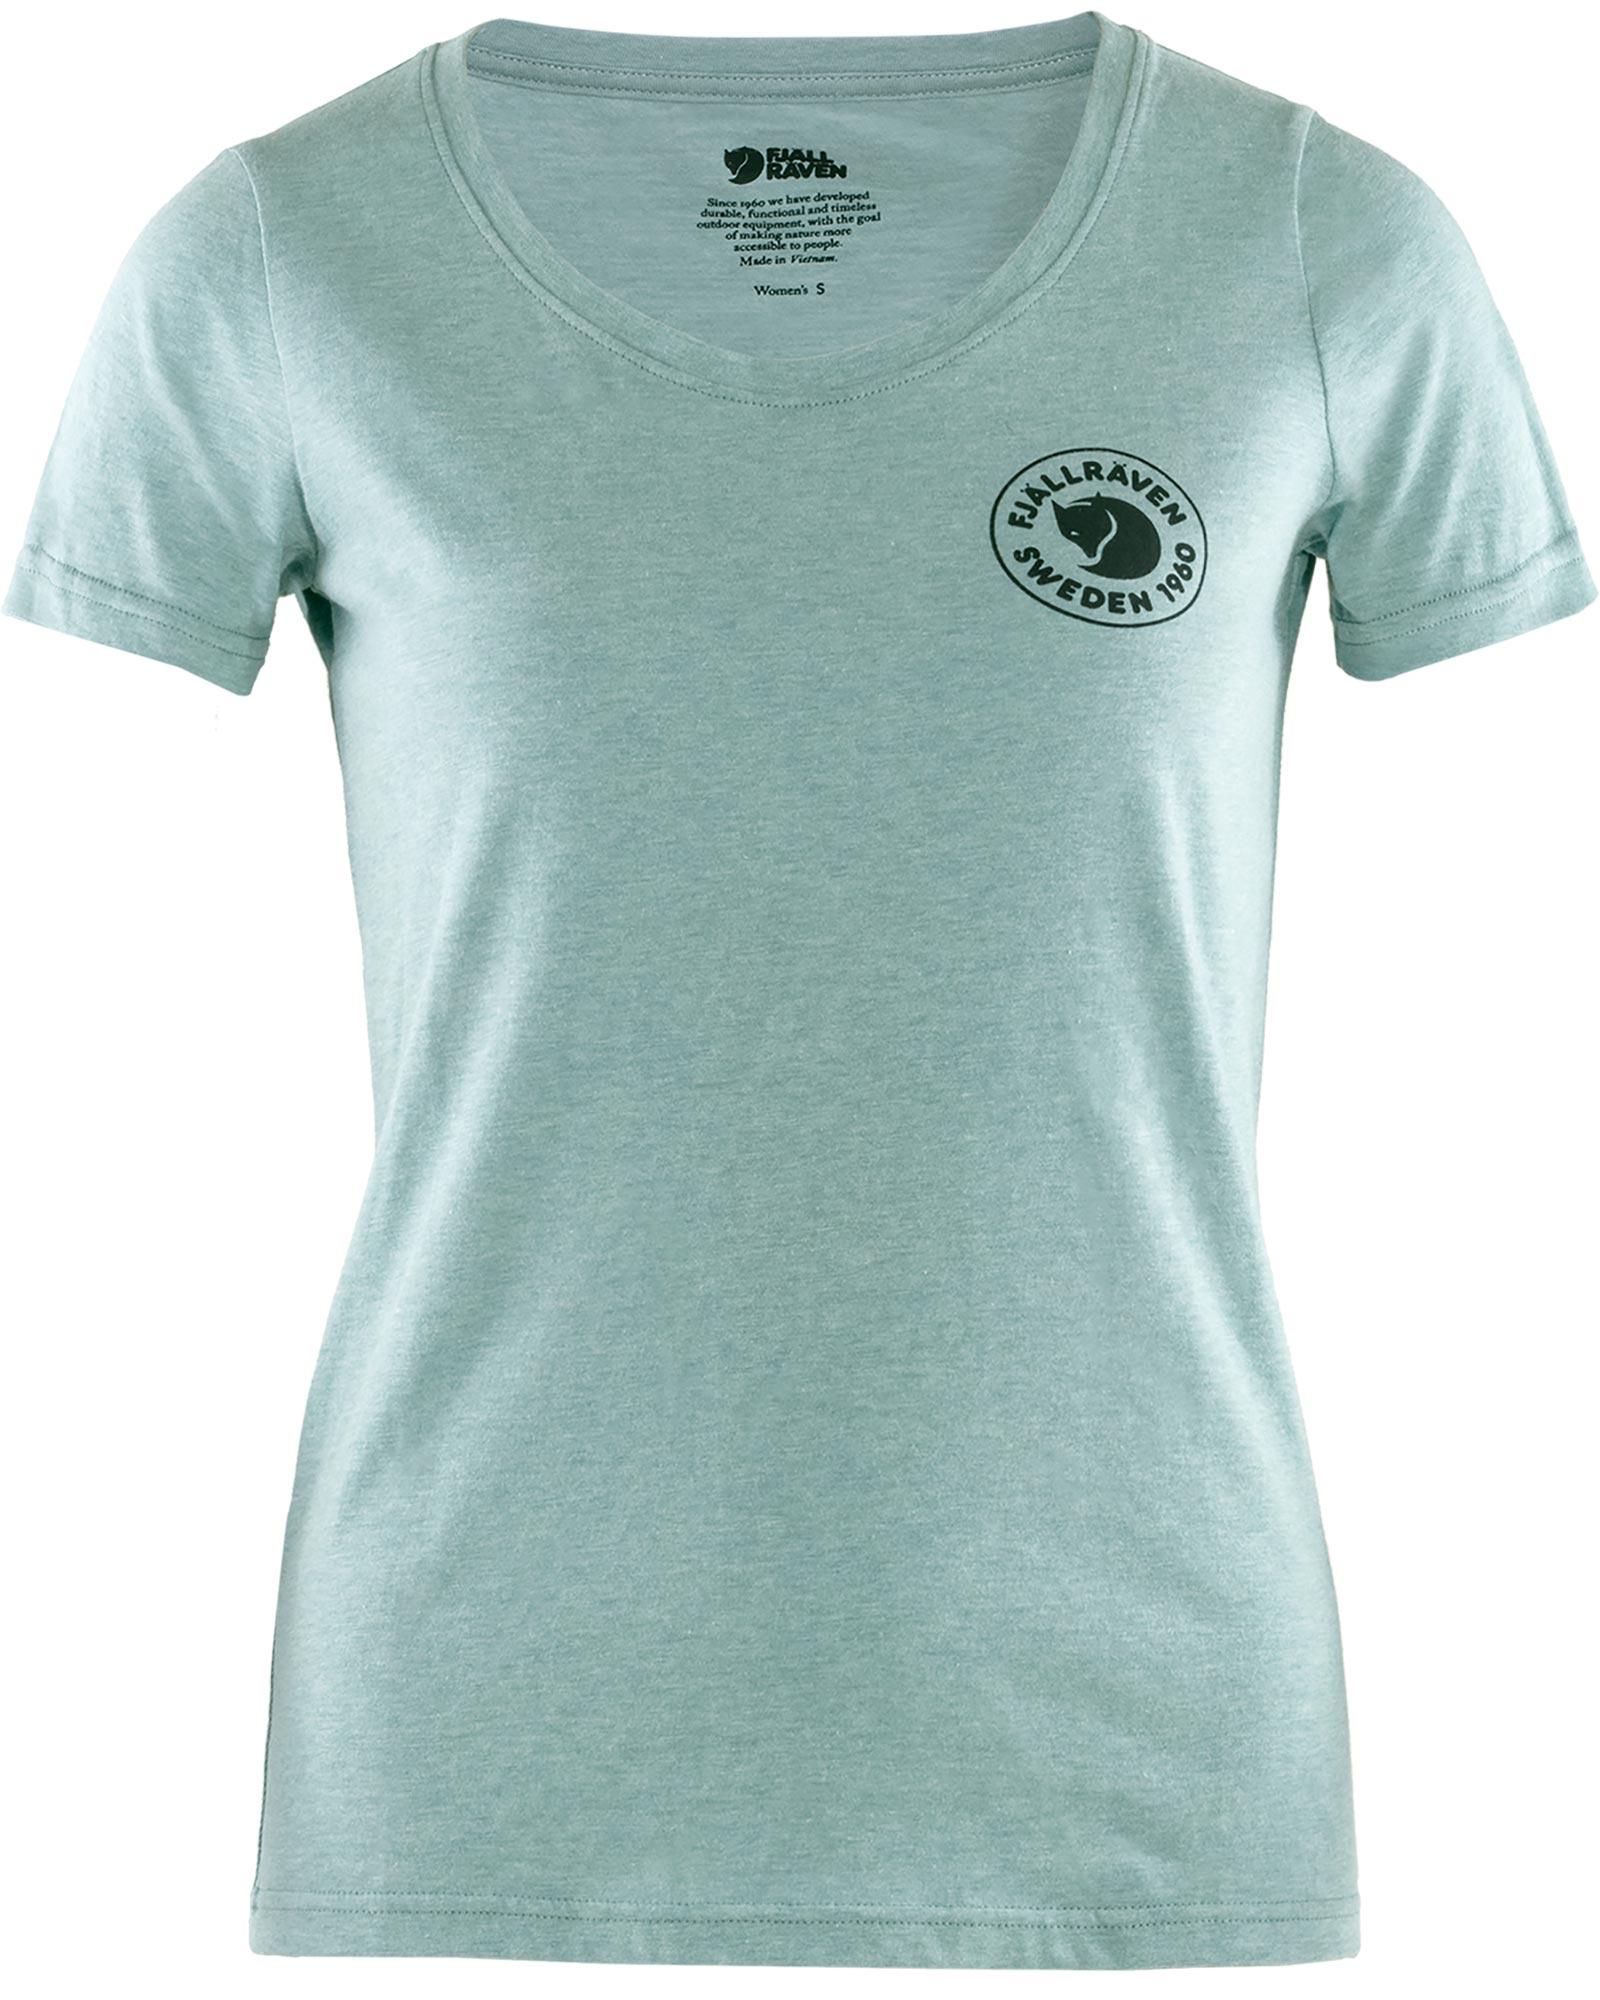 Fjallraven Women's Fjällräven 1960 Logo T-Shirt 0